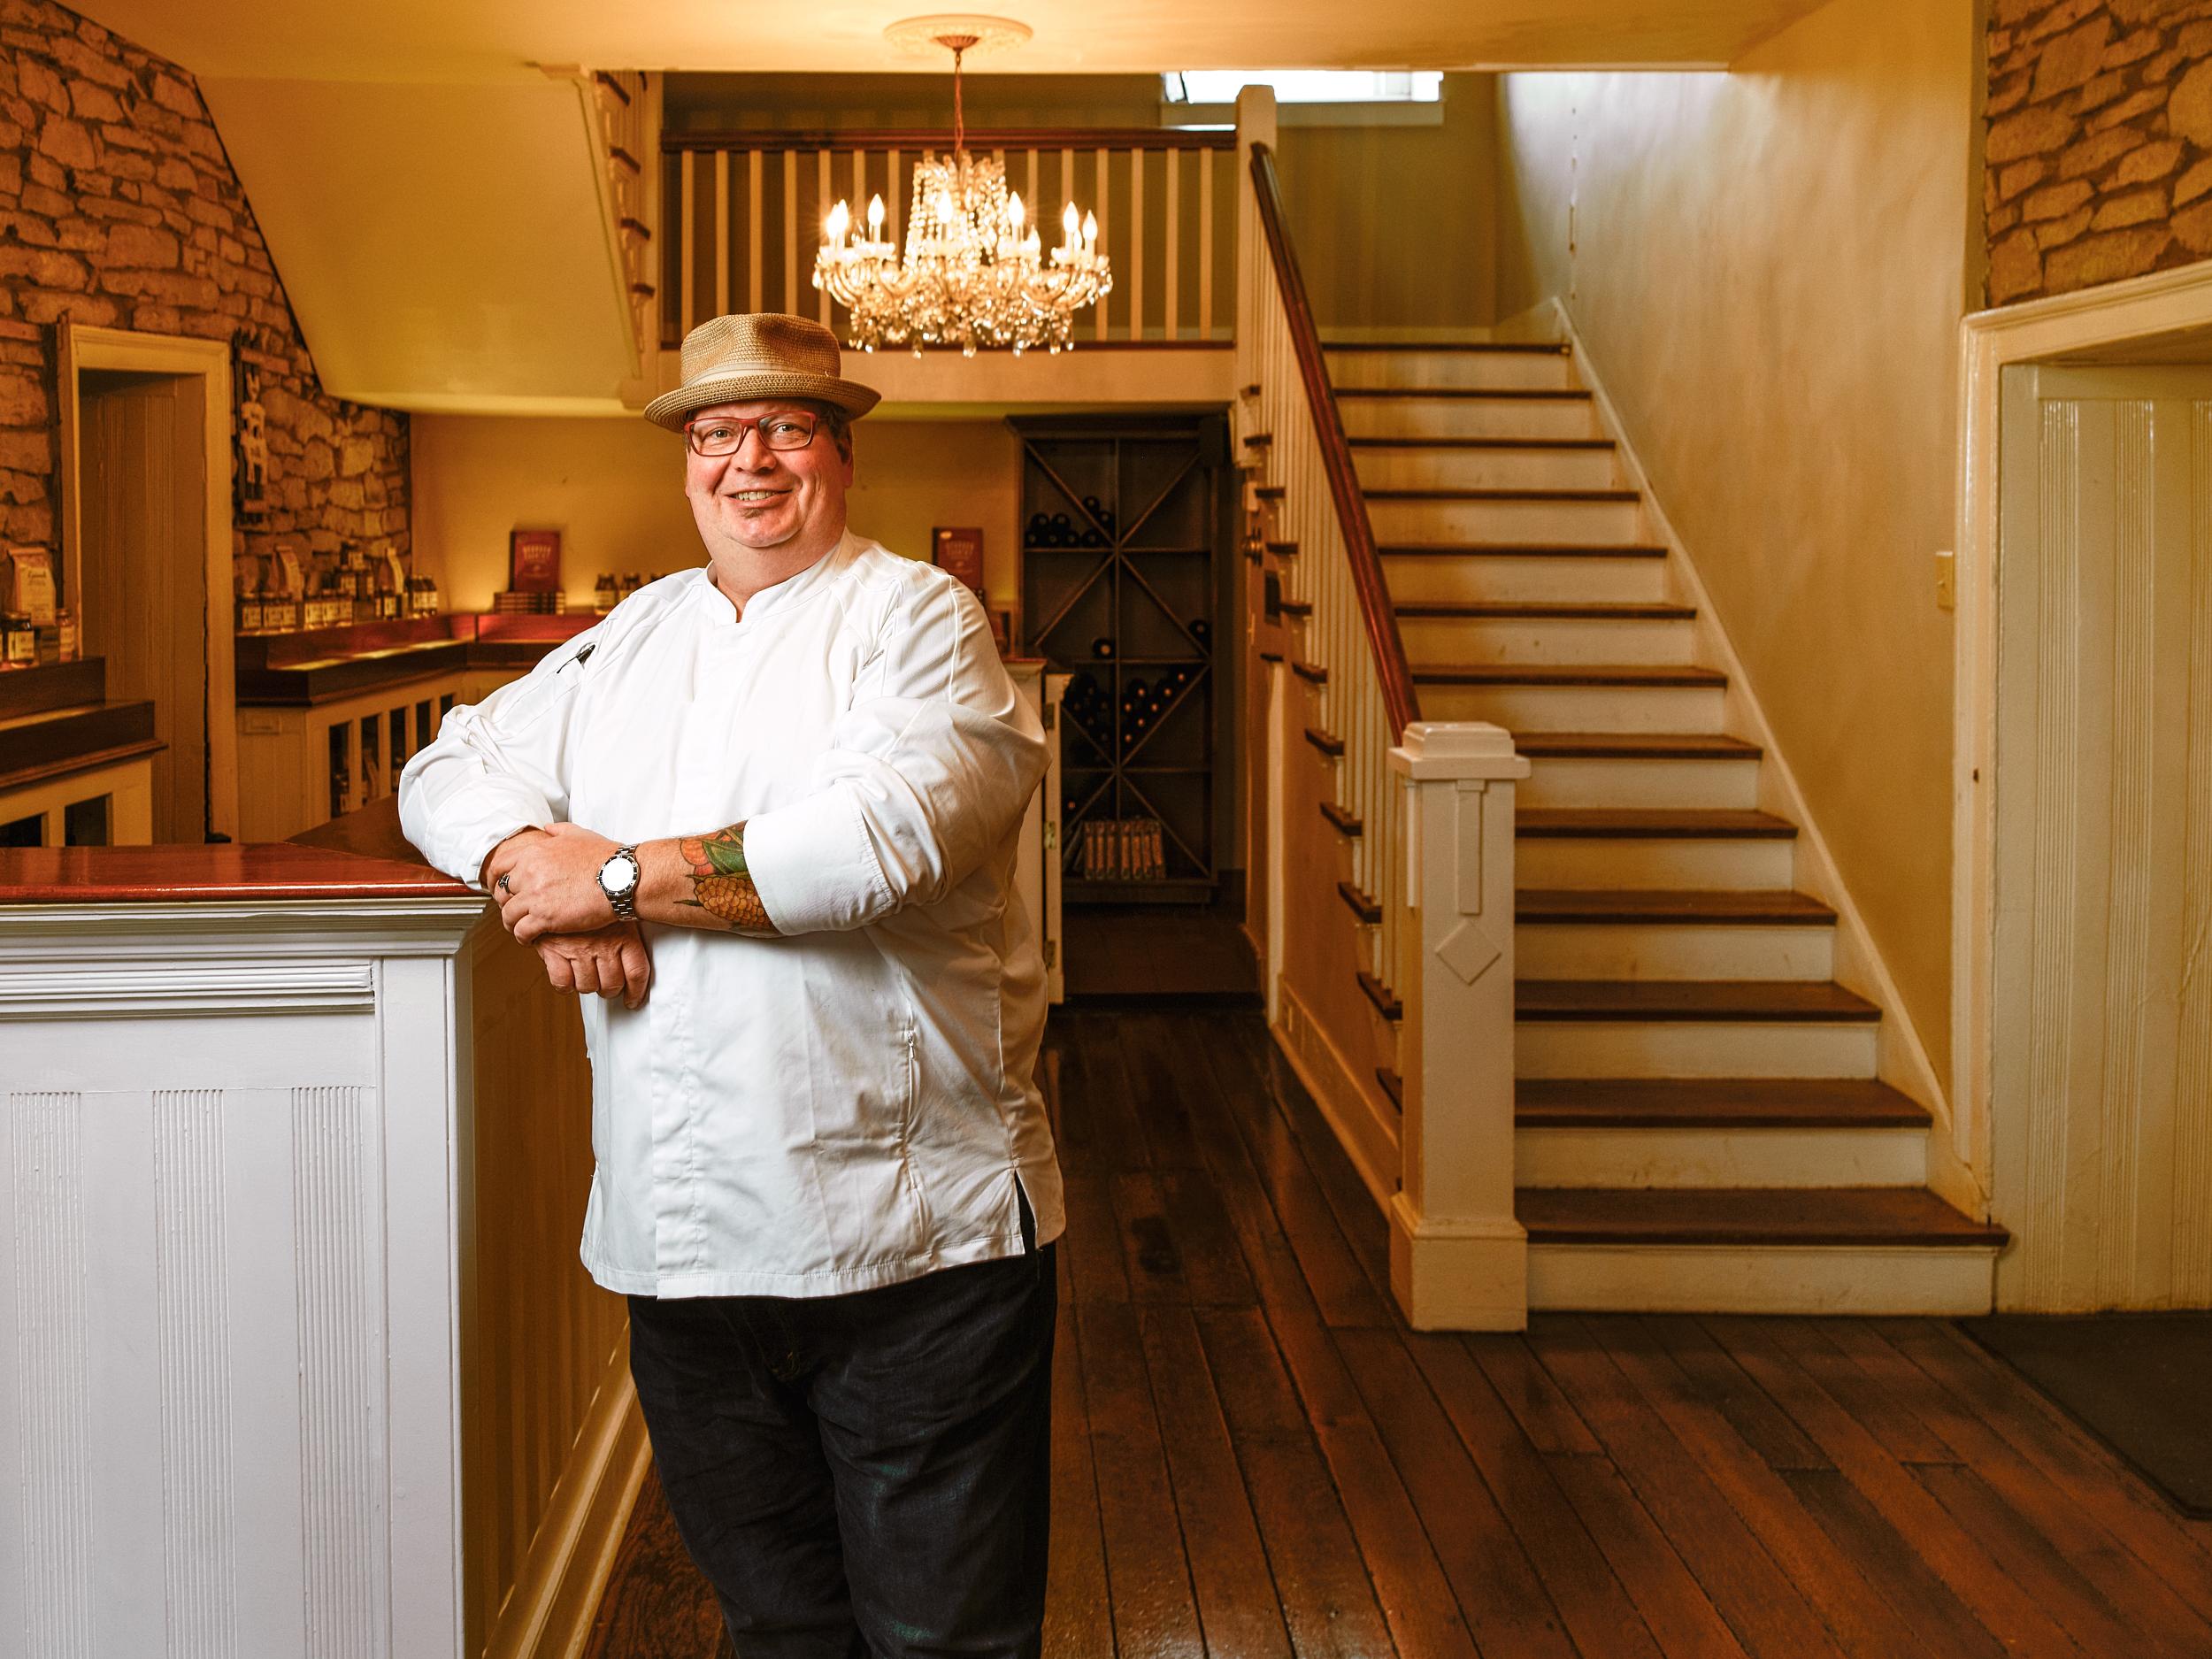 Chef David Danielson